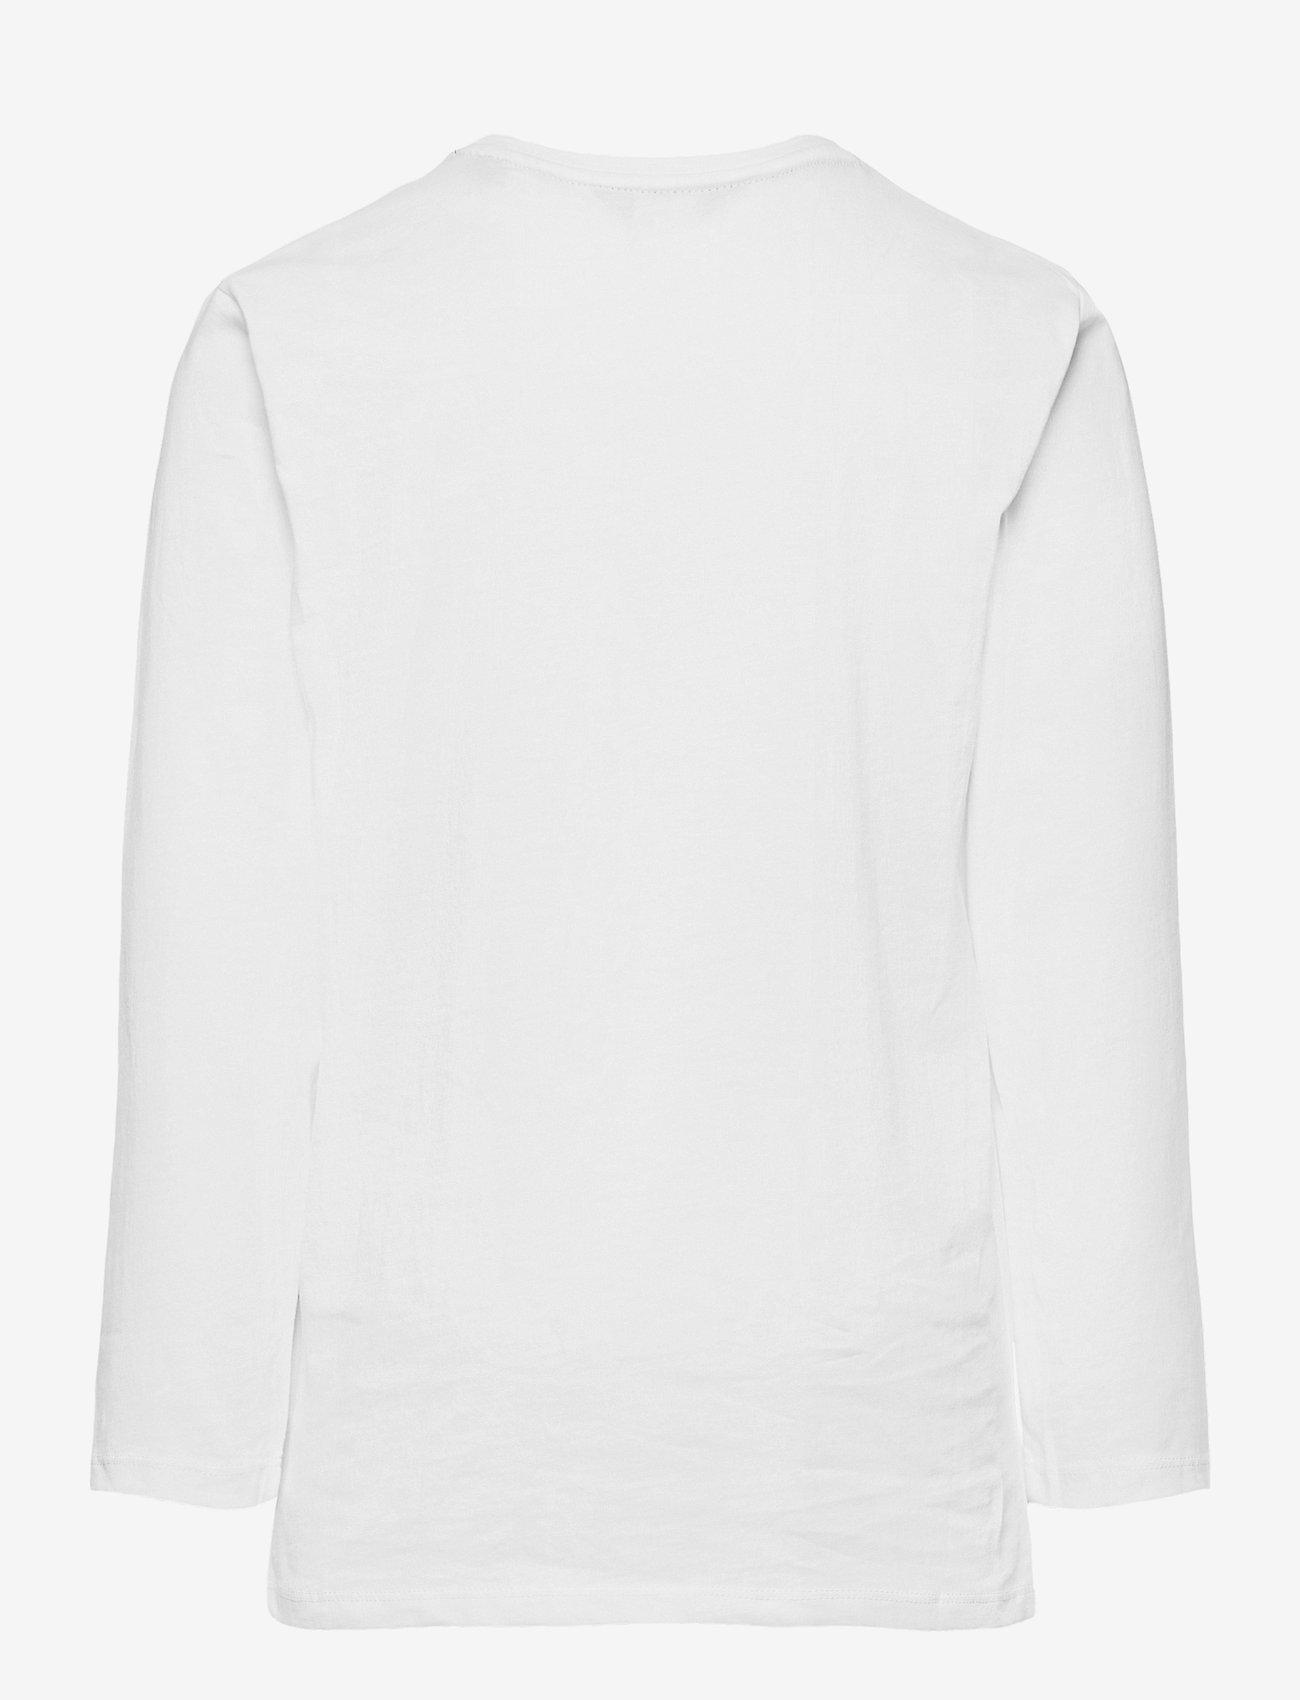 GANT - GANT LOCK-UP LS T-SHIRT - long-sleeved t-shirts - white - 1